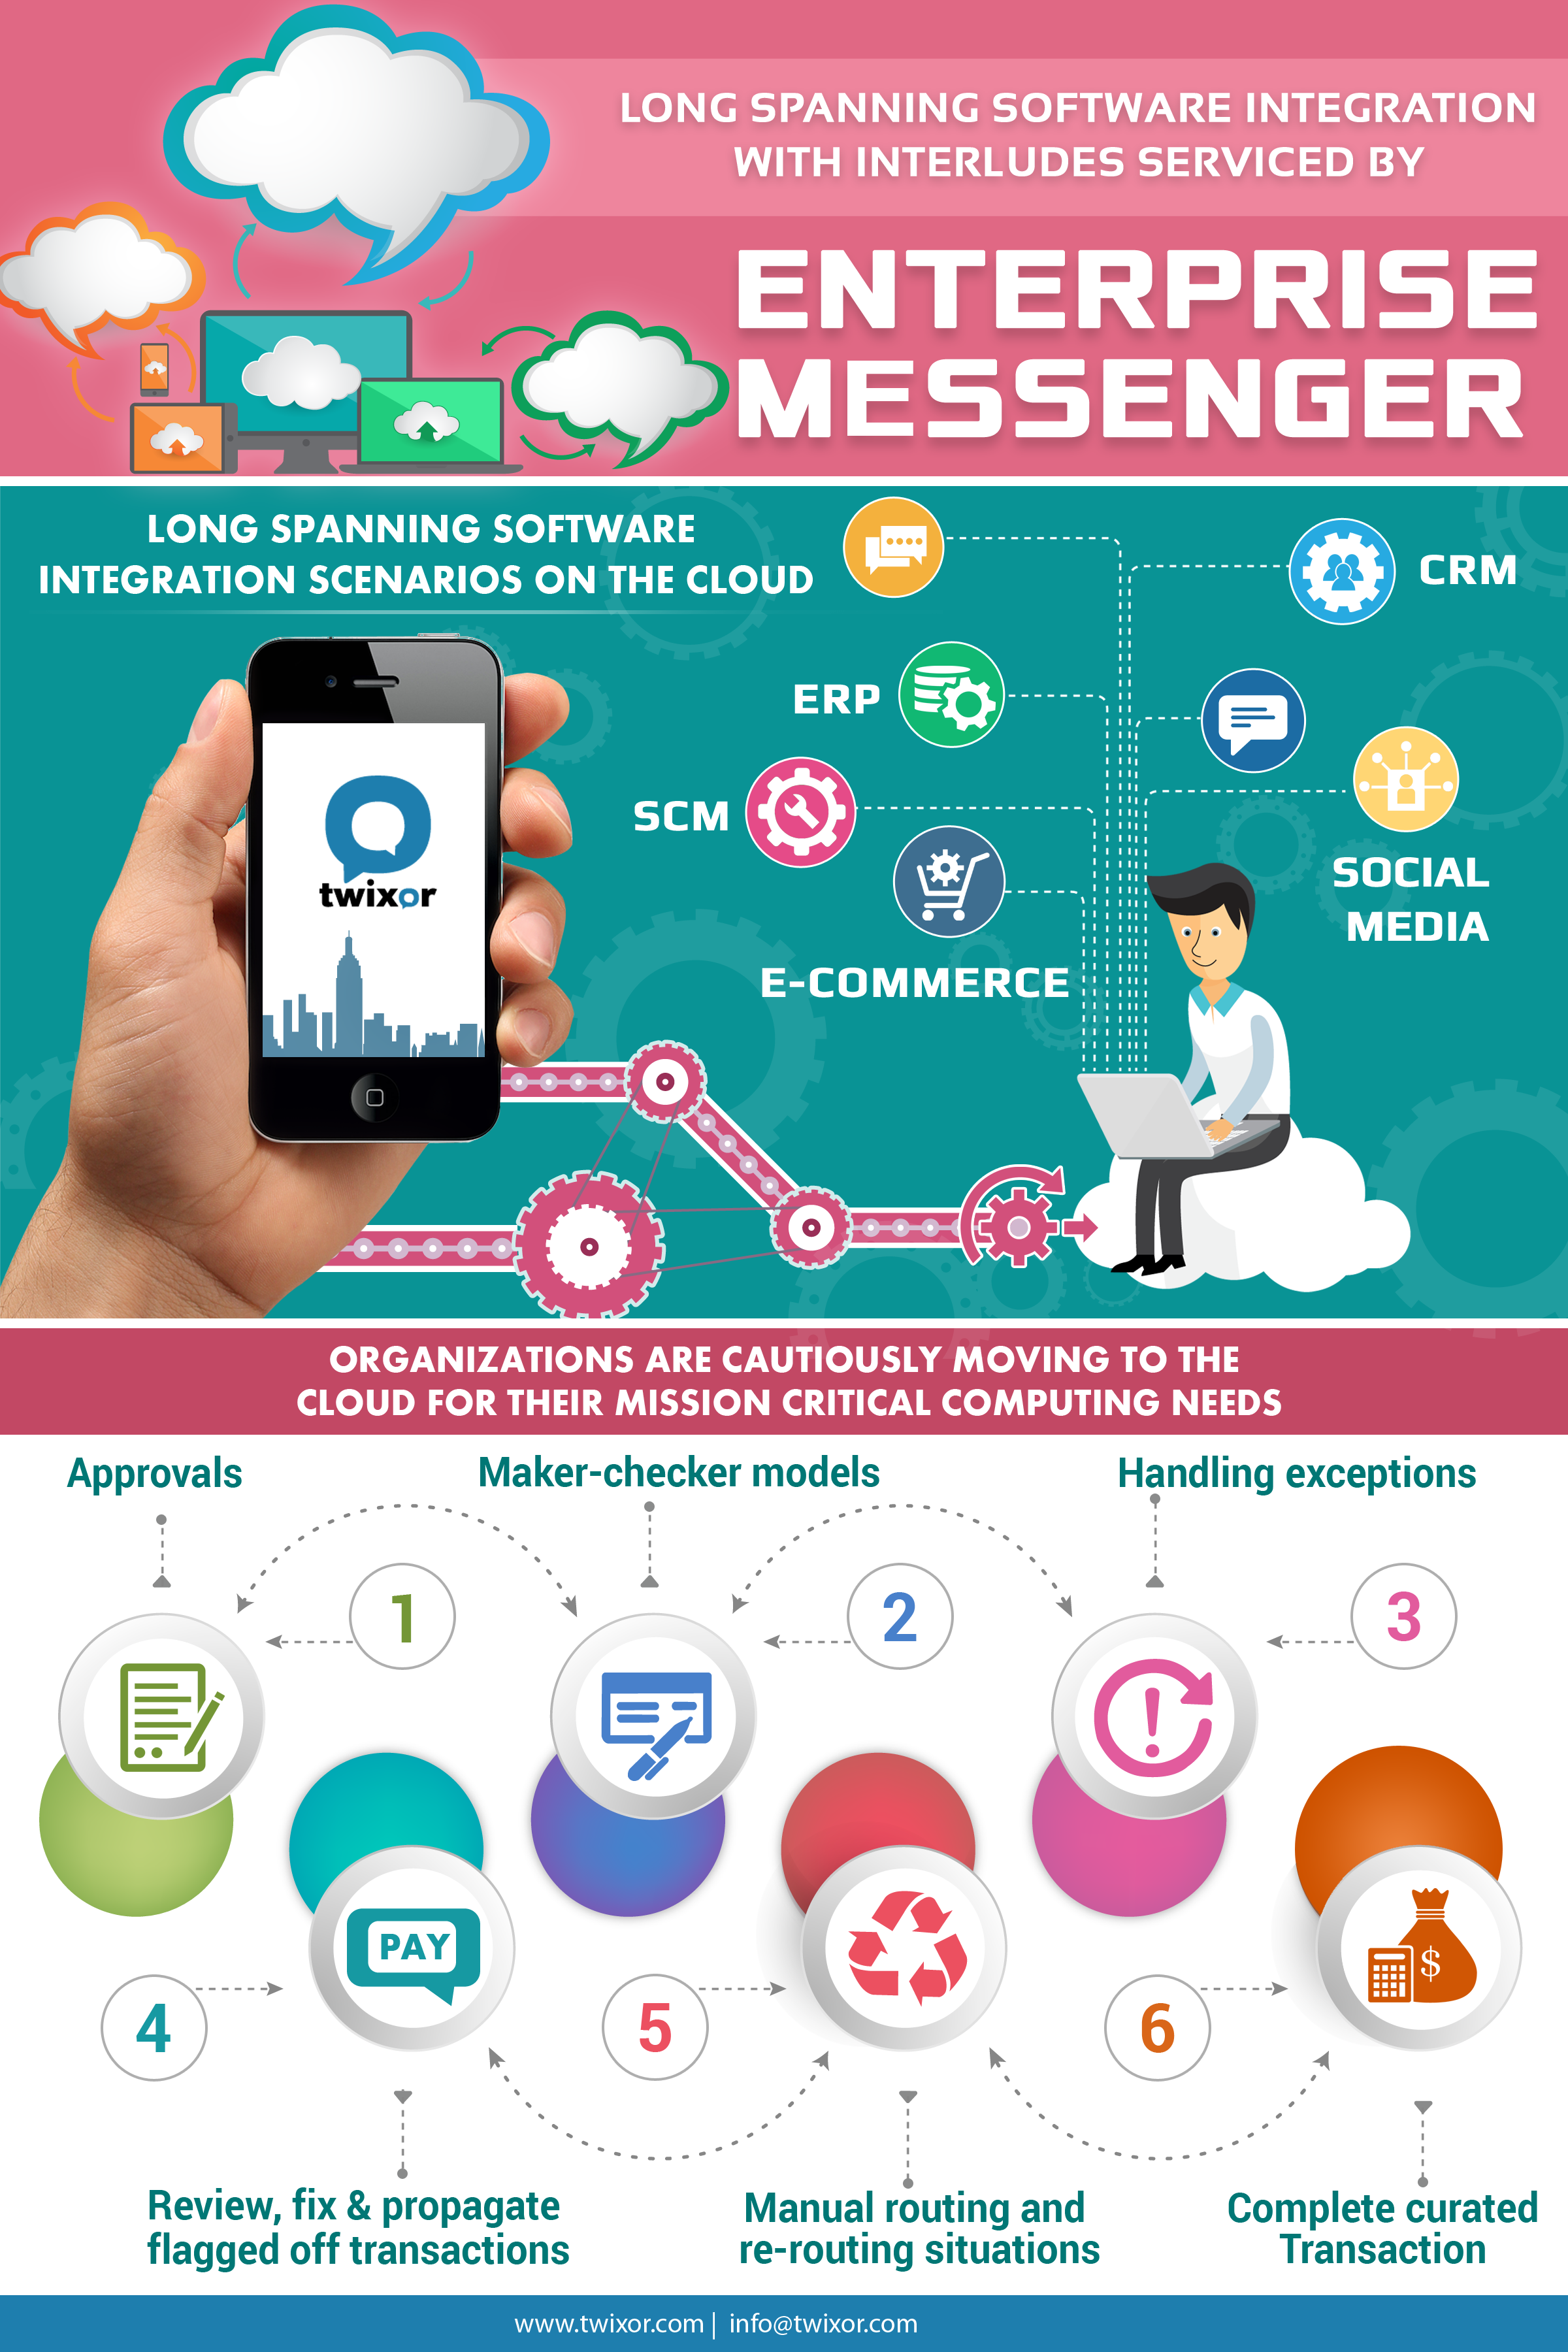 LONG SPANNING SOFTWARE INTERGRATION Instant messaging